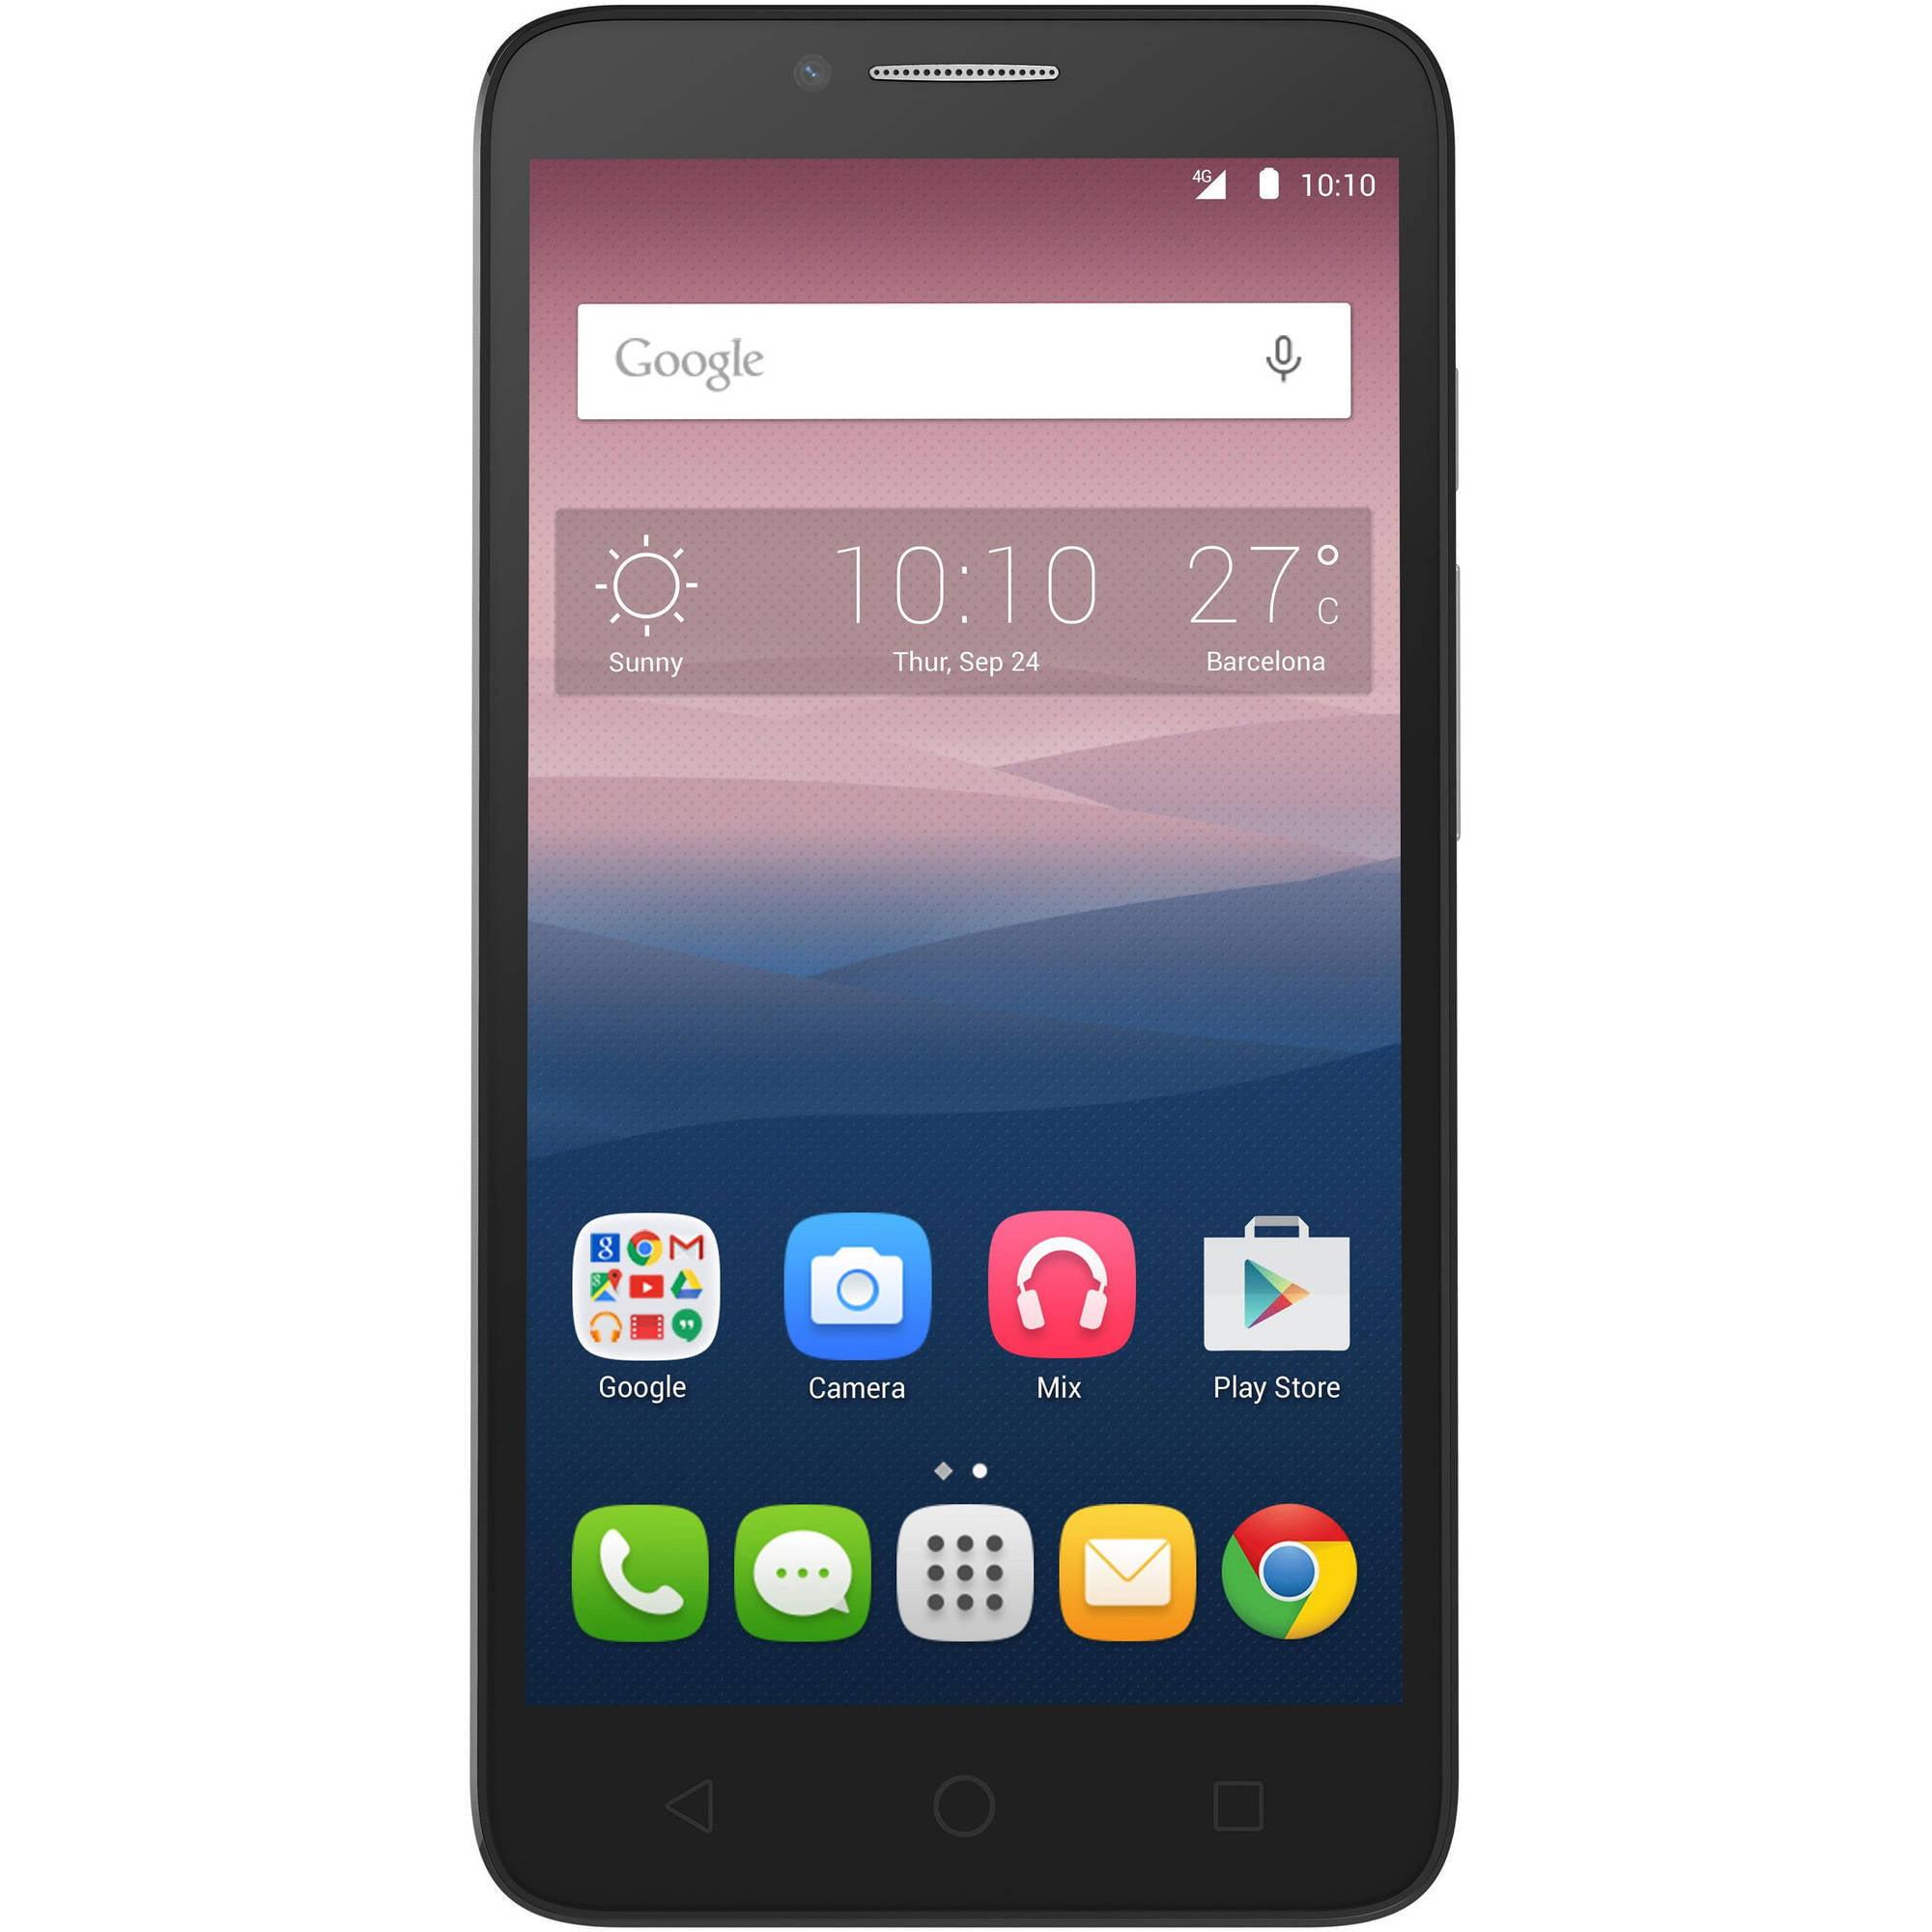 Alcatel OneTouch Pixi 3 Smartphone (Unlocked), Walmart Exclusive